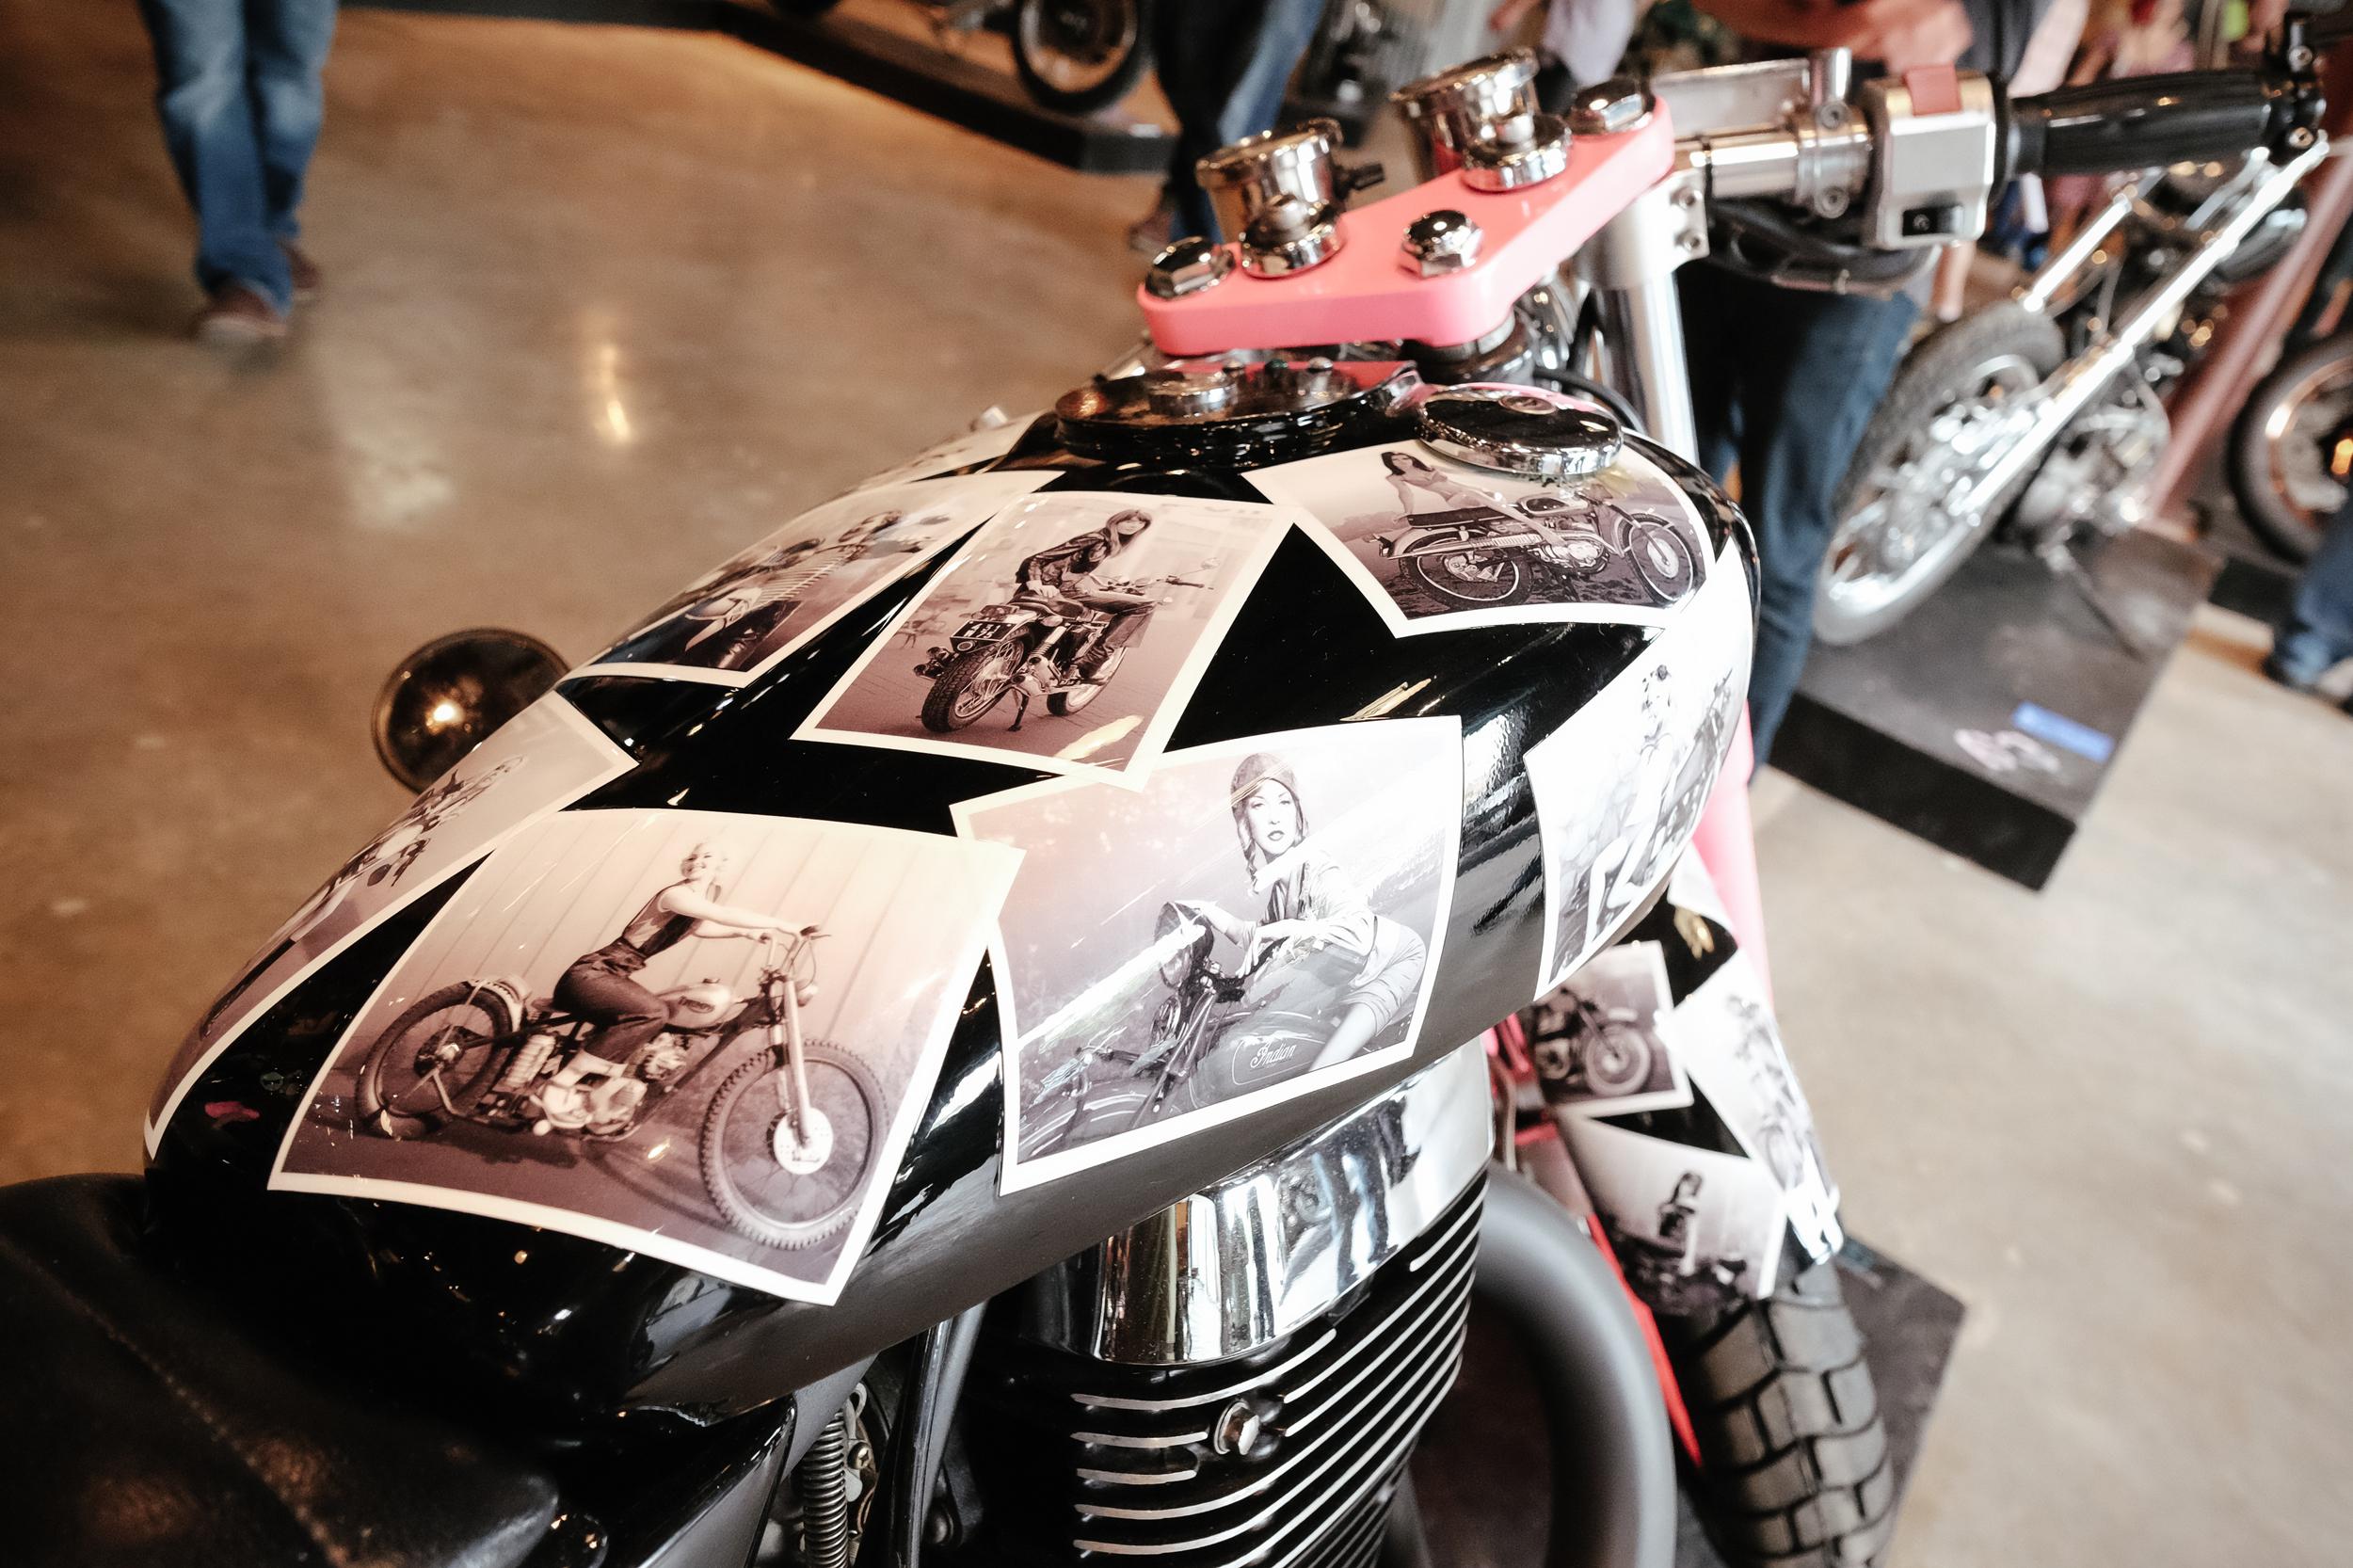 Handbuilt-Motorcycle-Show-2015-8099.jpg